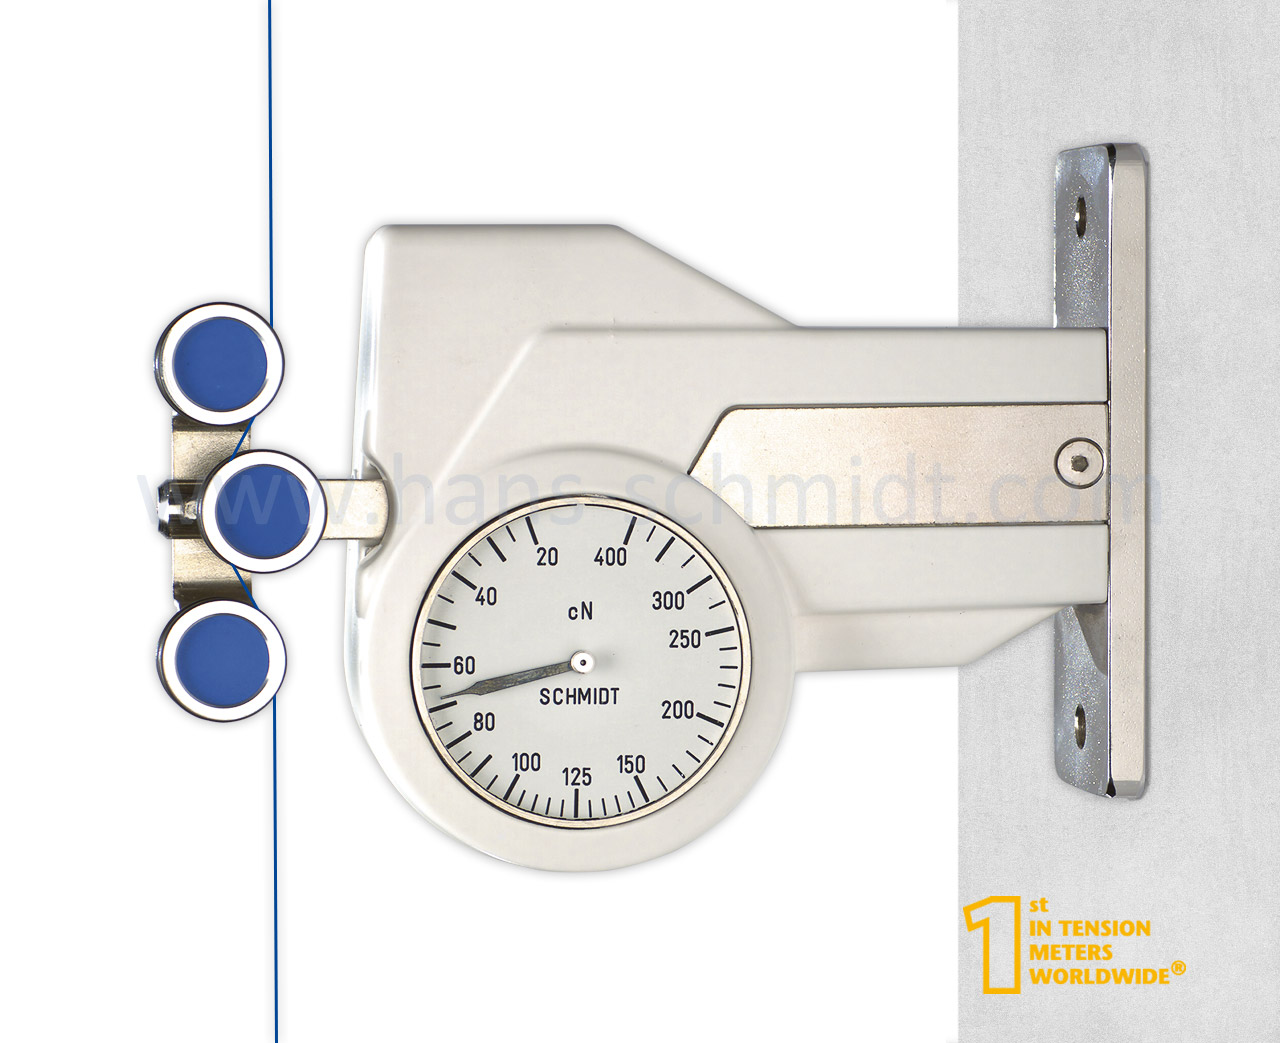 Tension Meter DX2S, stationary mechanical device - Hans Schmidt